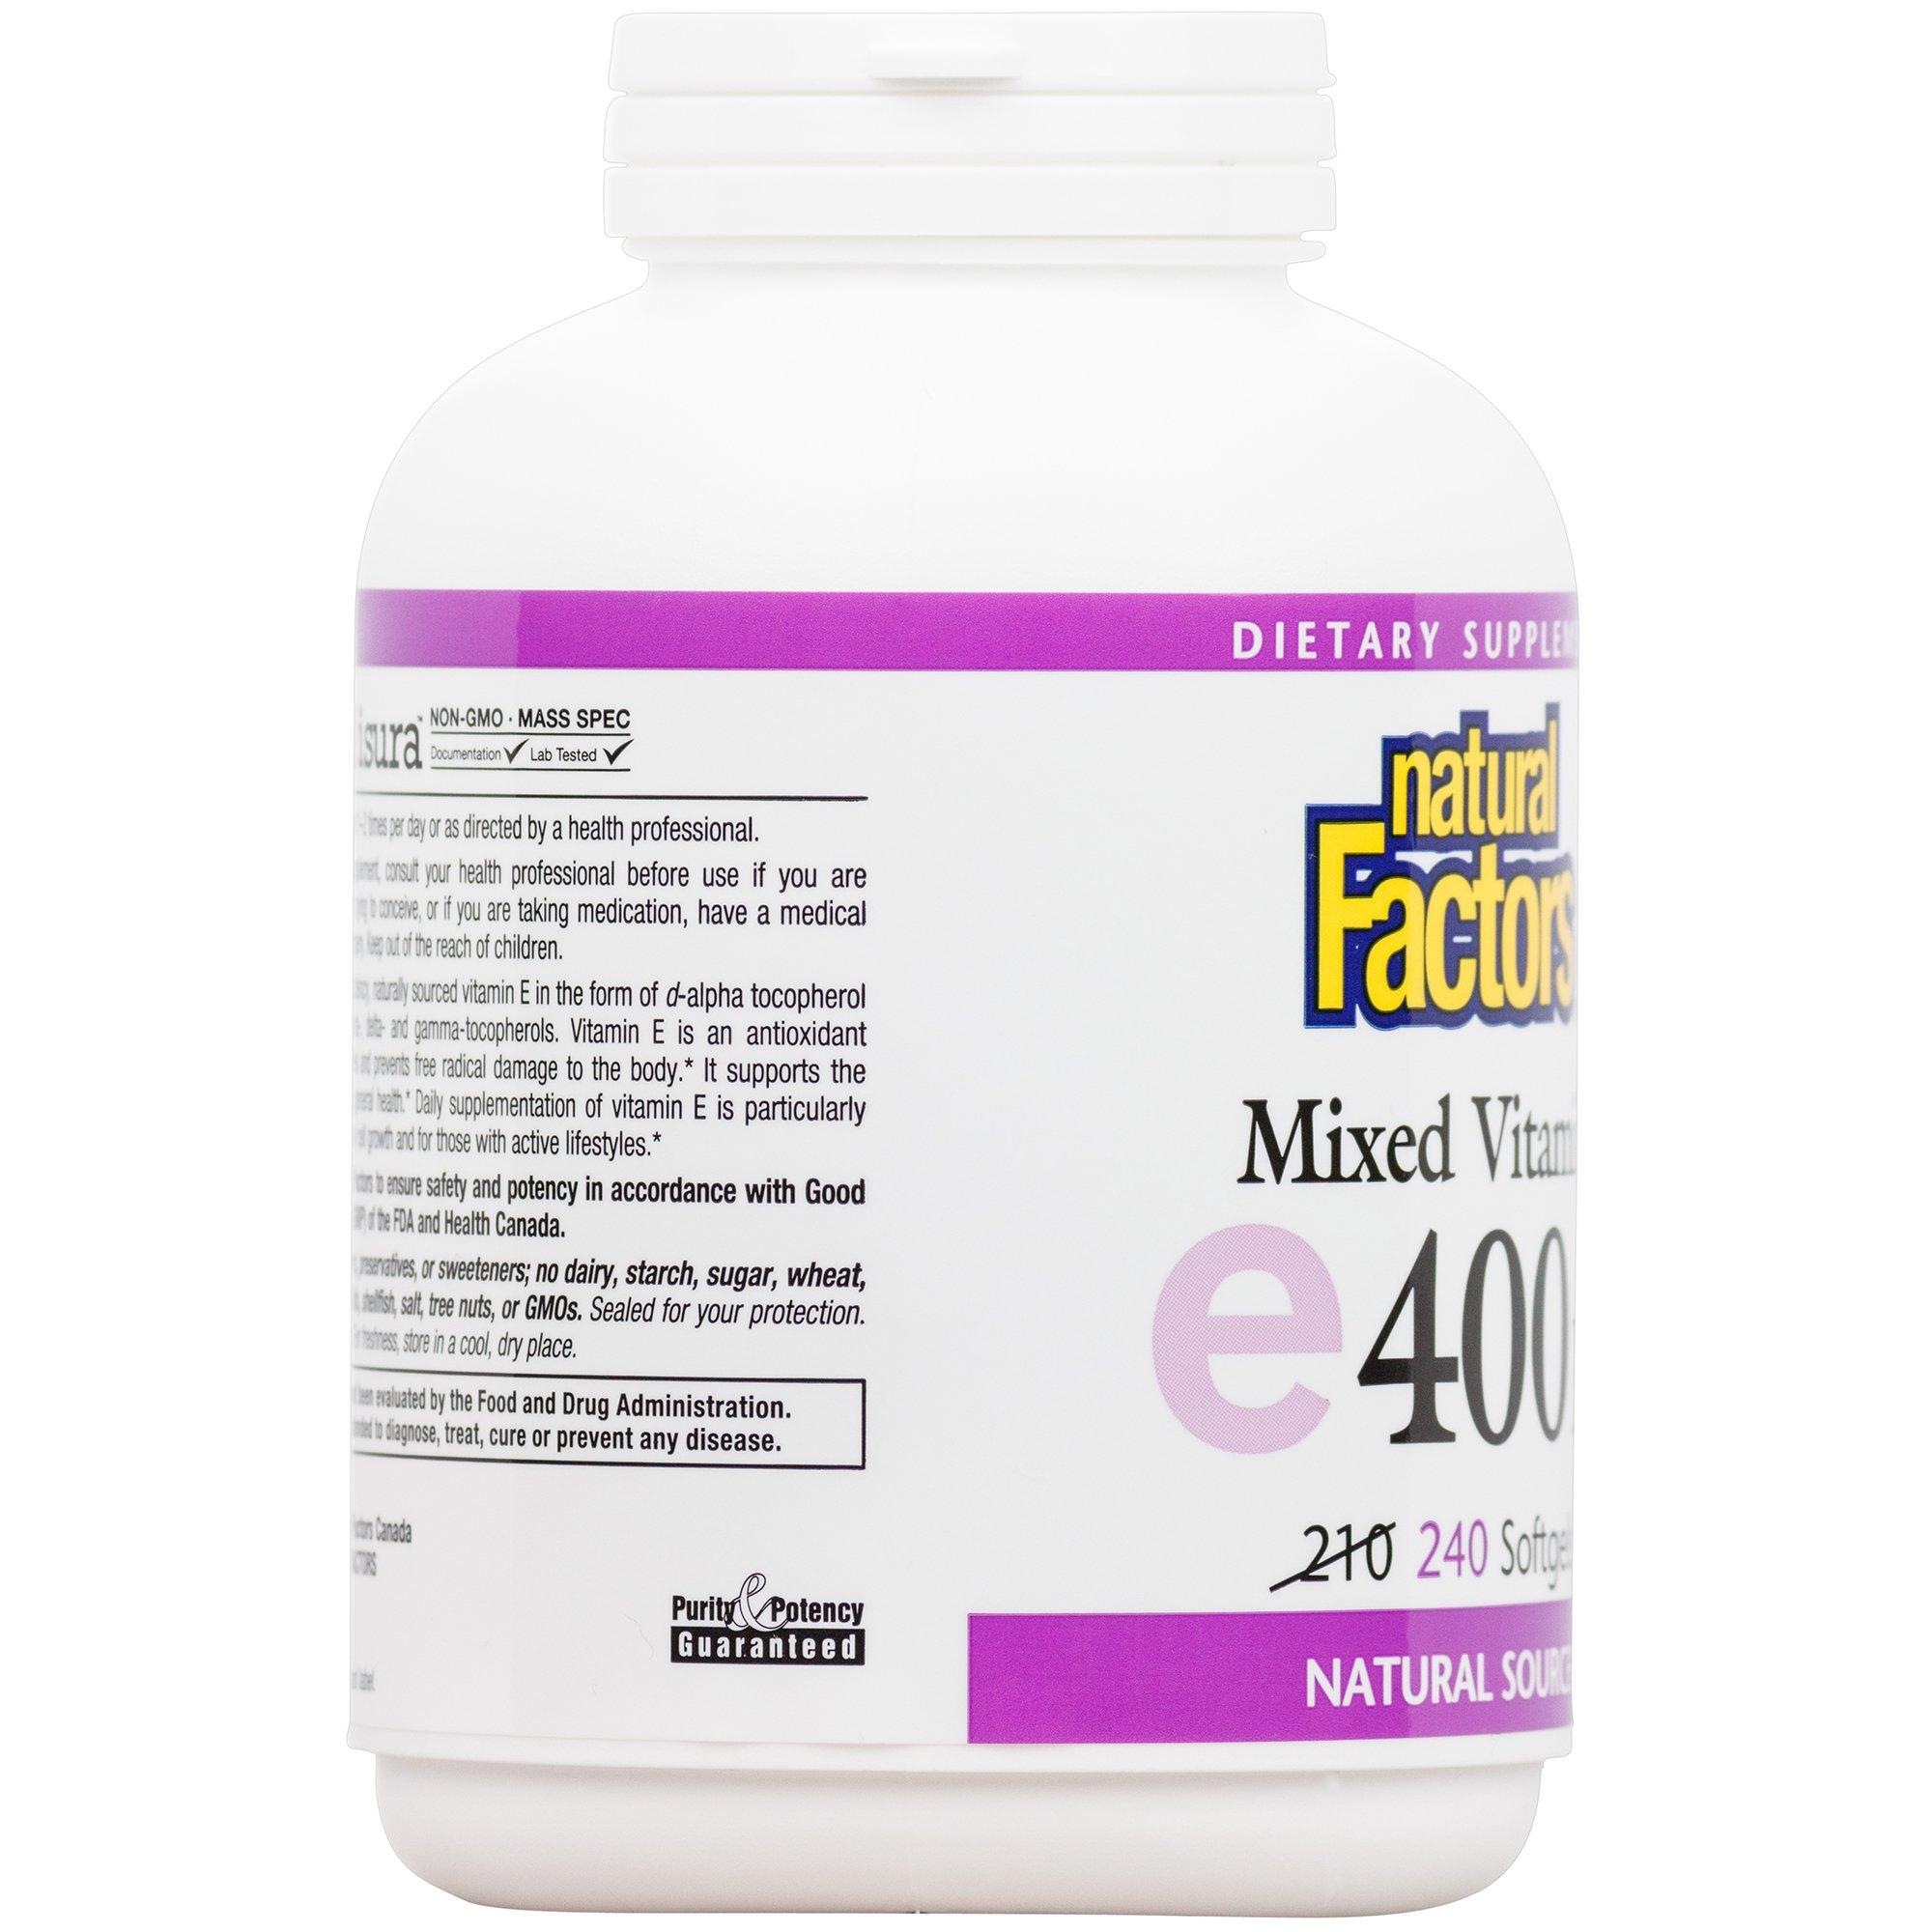 Natural Factors, Mixed Vitamin E 400 IU, Antioxidant Support for Cardiovascular and General Health, 240 softgels (240 servings)